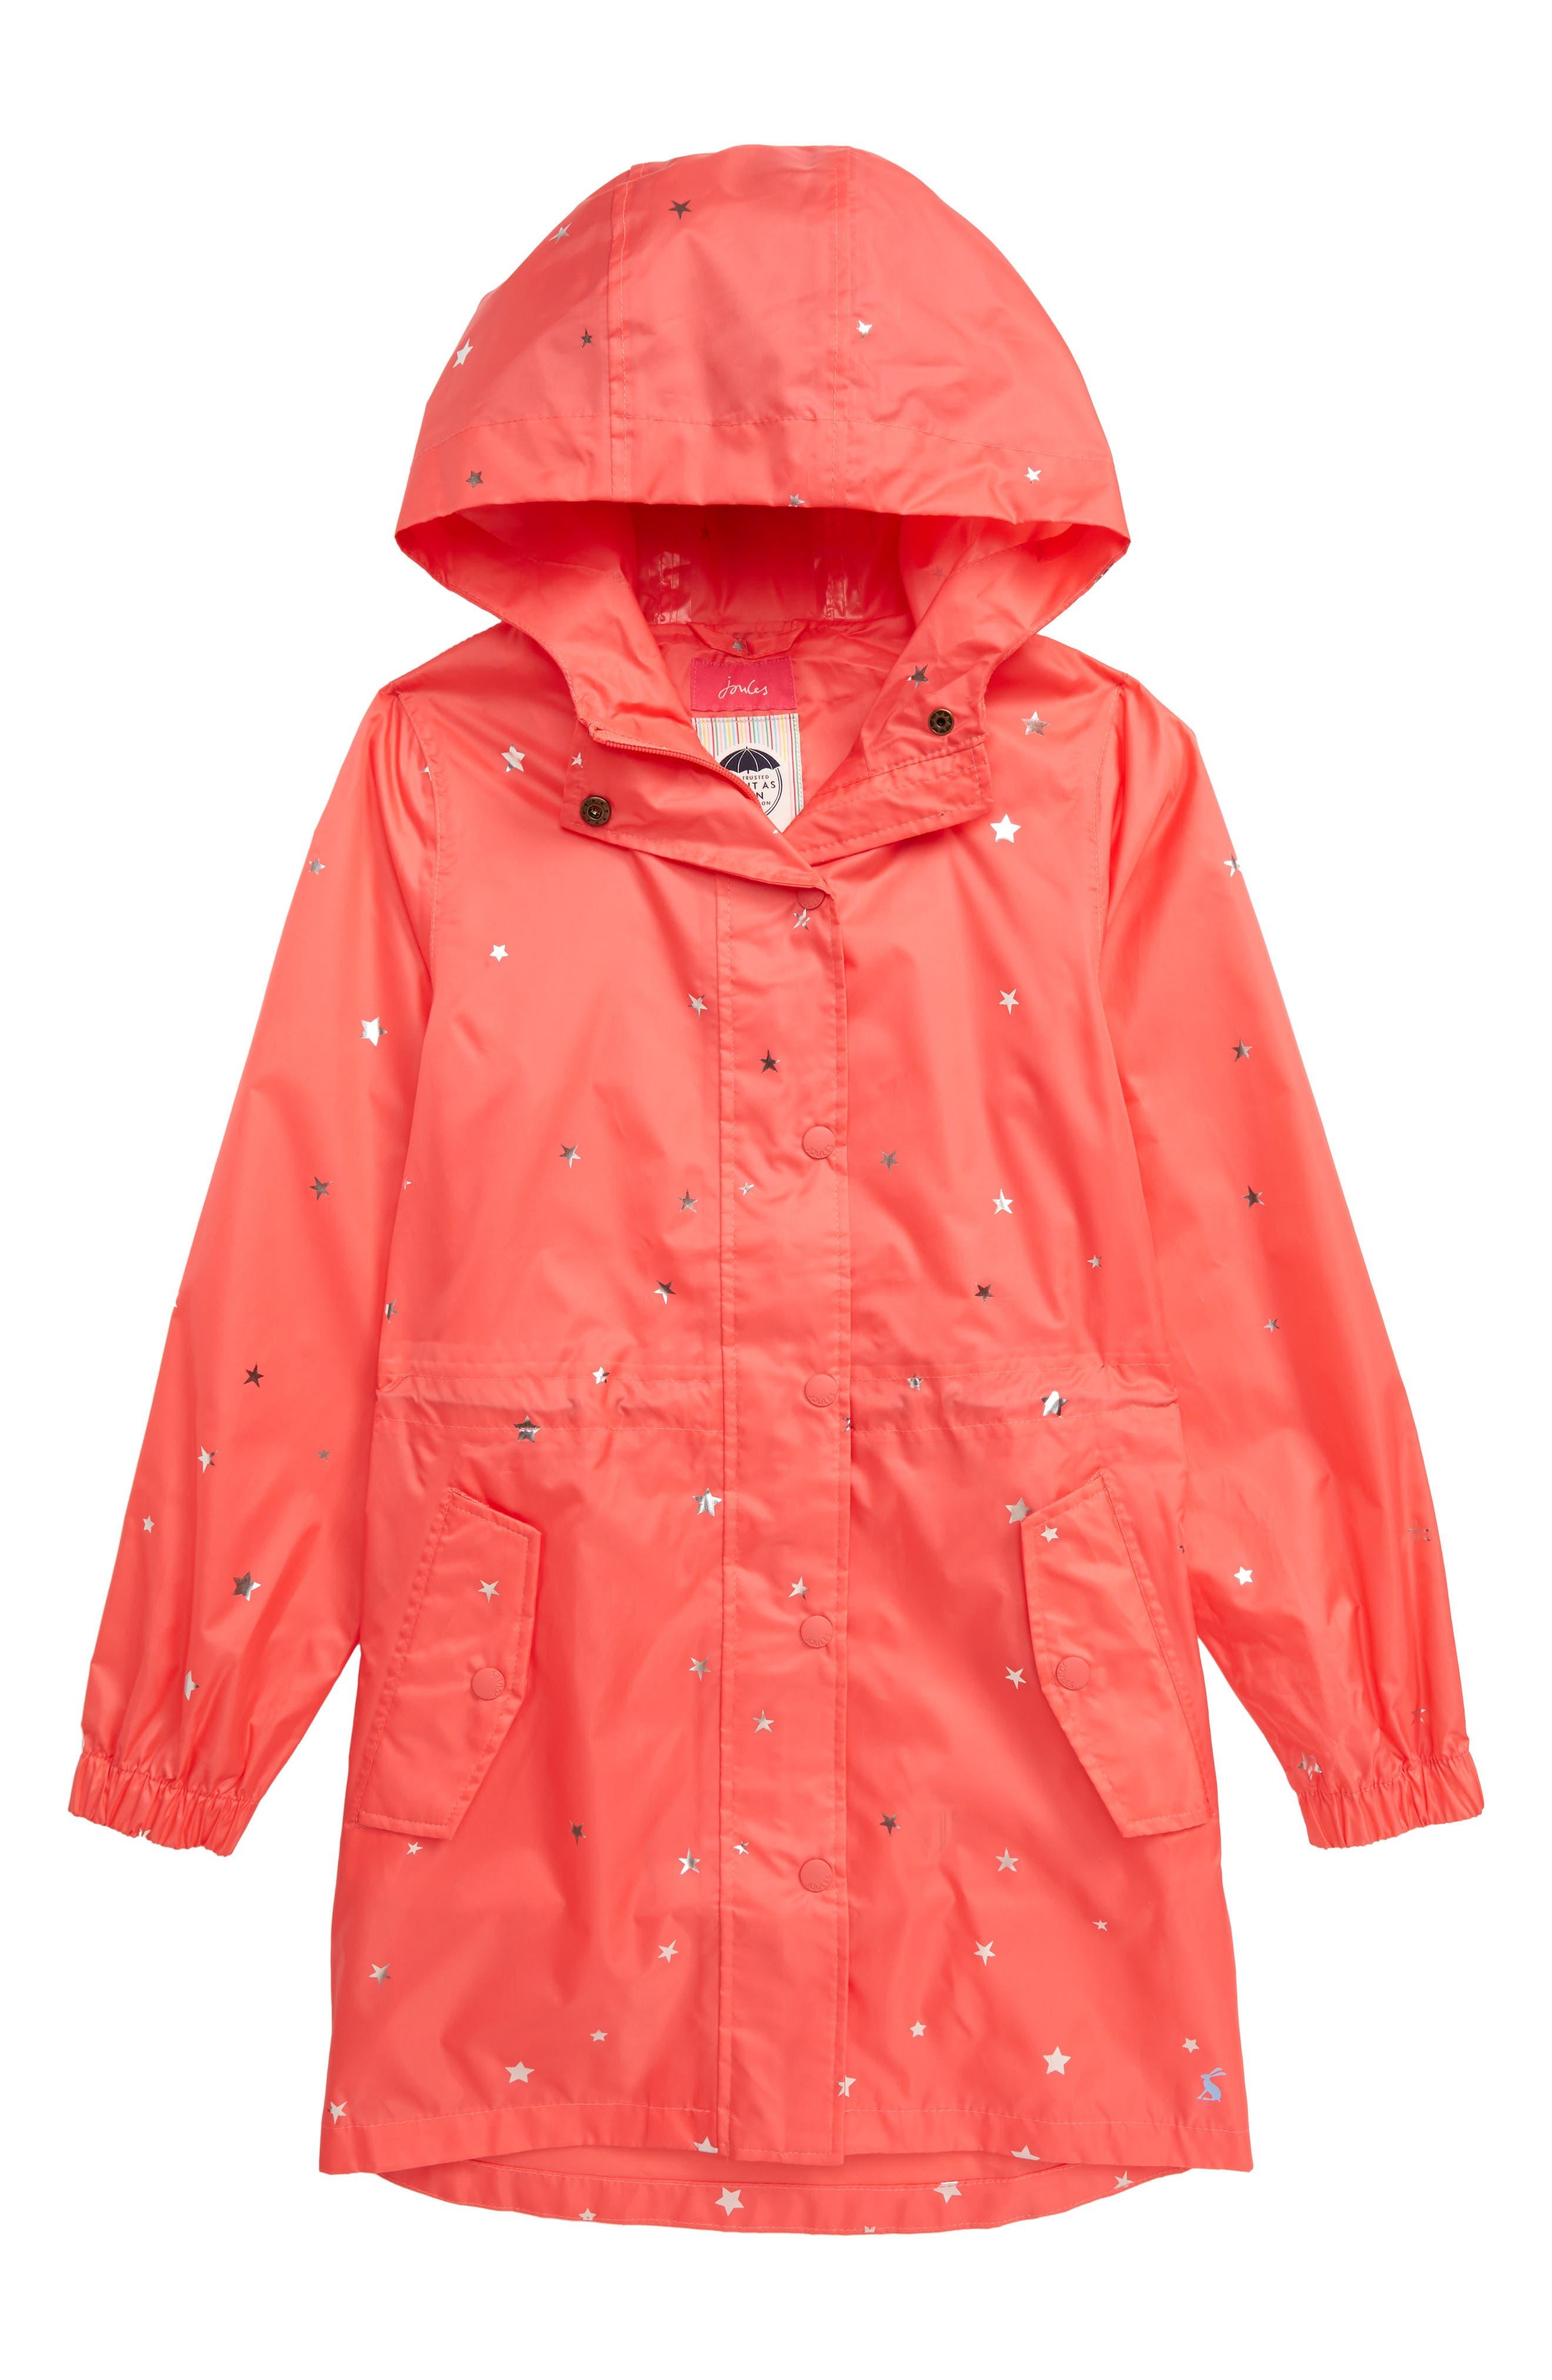 Toddler Girls Joules Golightly Packable Waterproof Rain Jacket Size 3Y  Pink